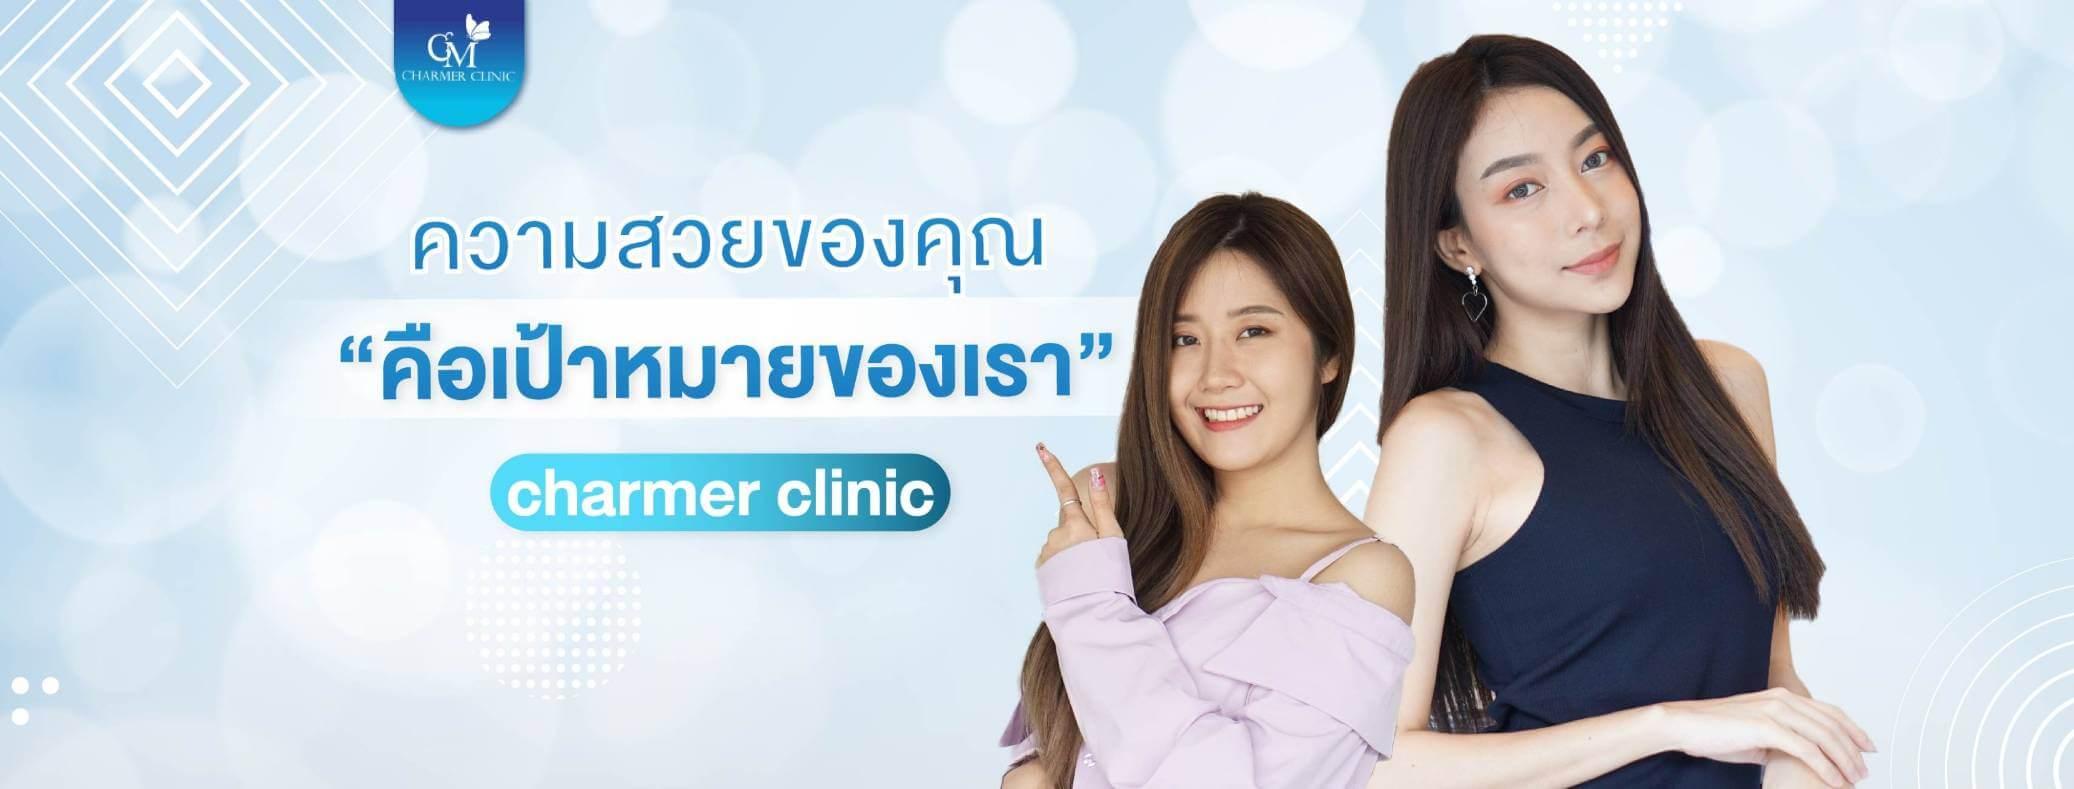 Charmer Clinic botox ร้อยไหม filler ลดแก้ม ลดริ้วรอย